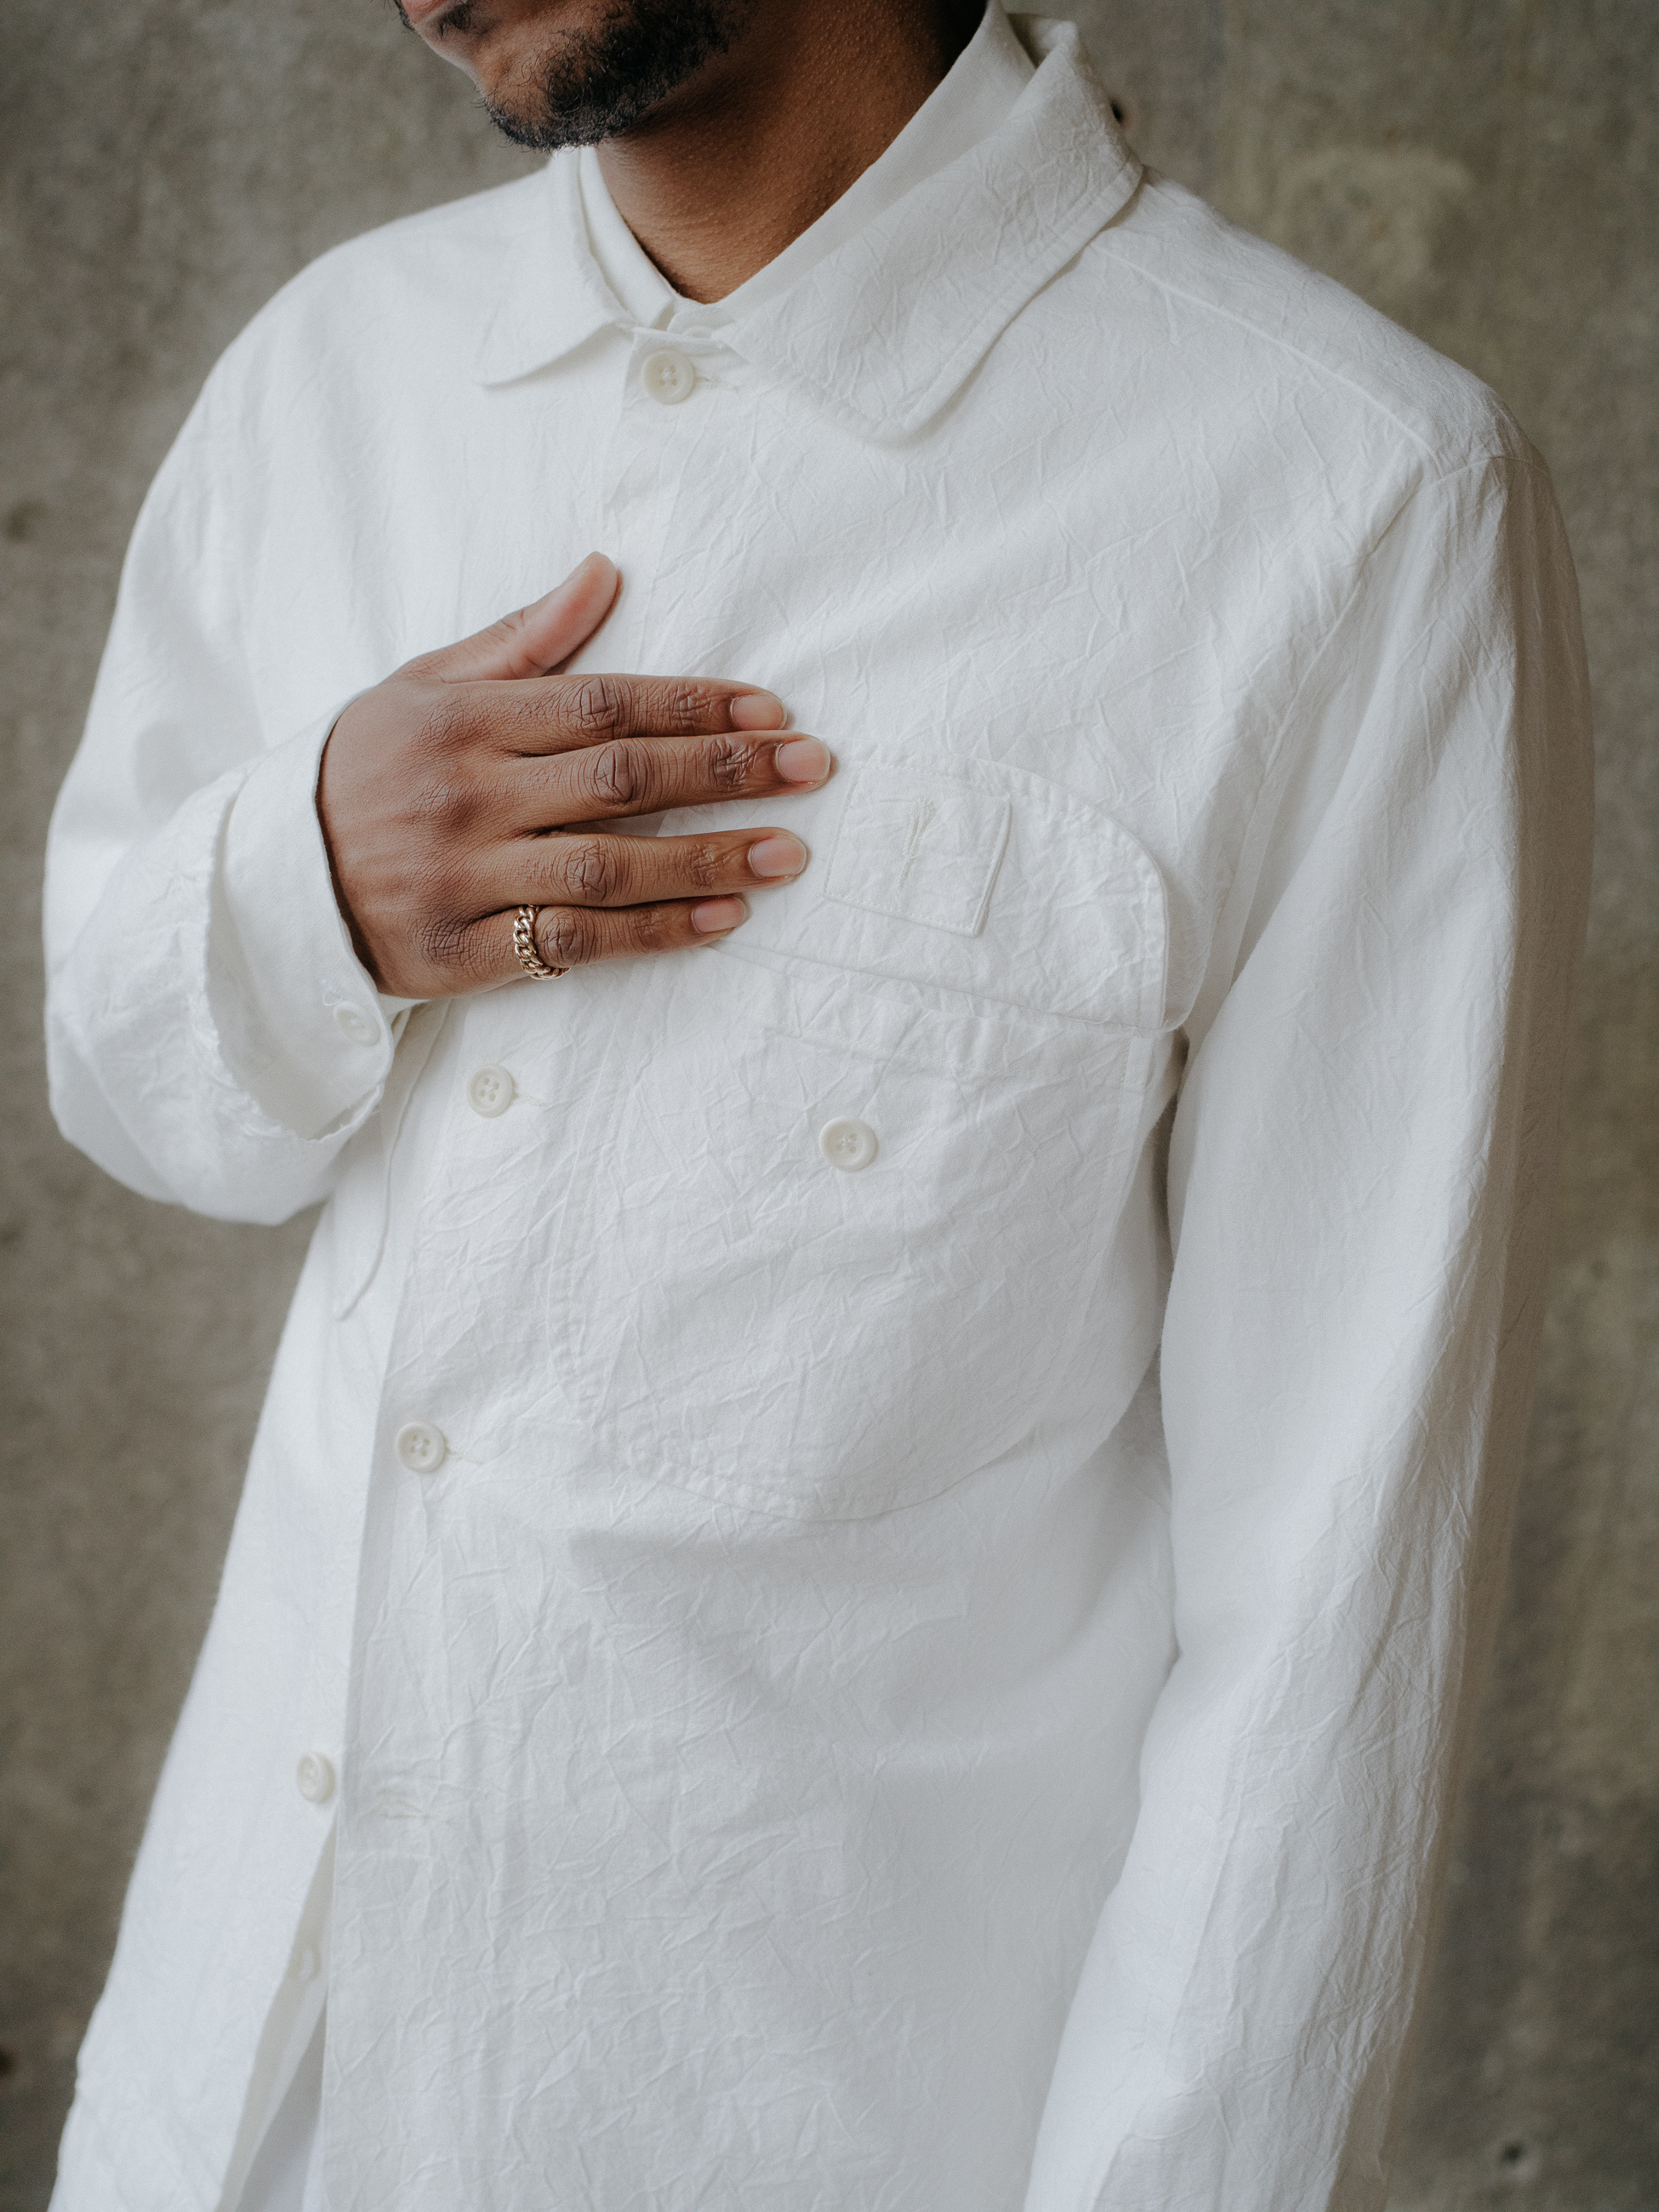 evan-kinori-field-shirt-crinkle-cotton-japan-7